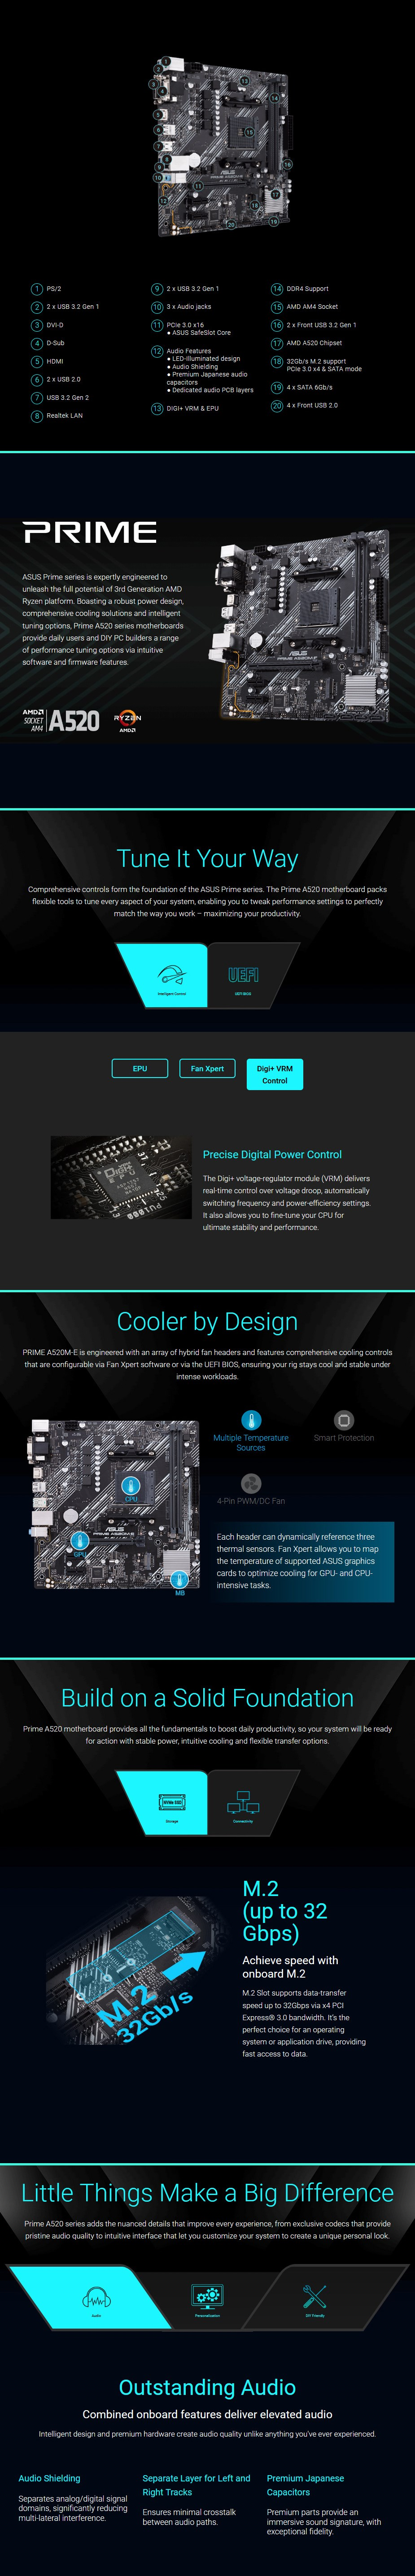 asus-prime-a520me-am4-microatx-motherboard-ac37329-9.jpg